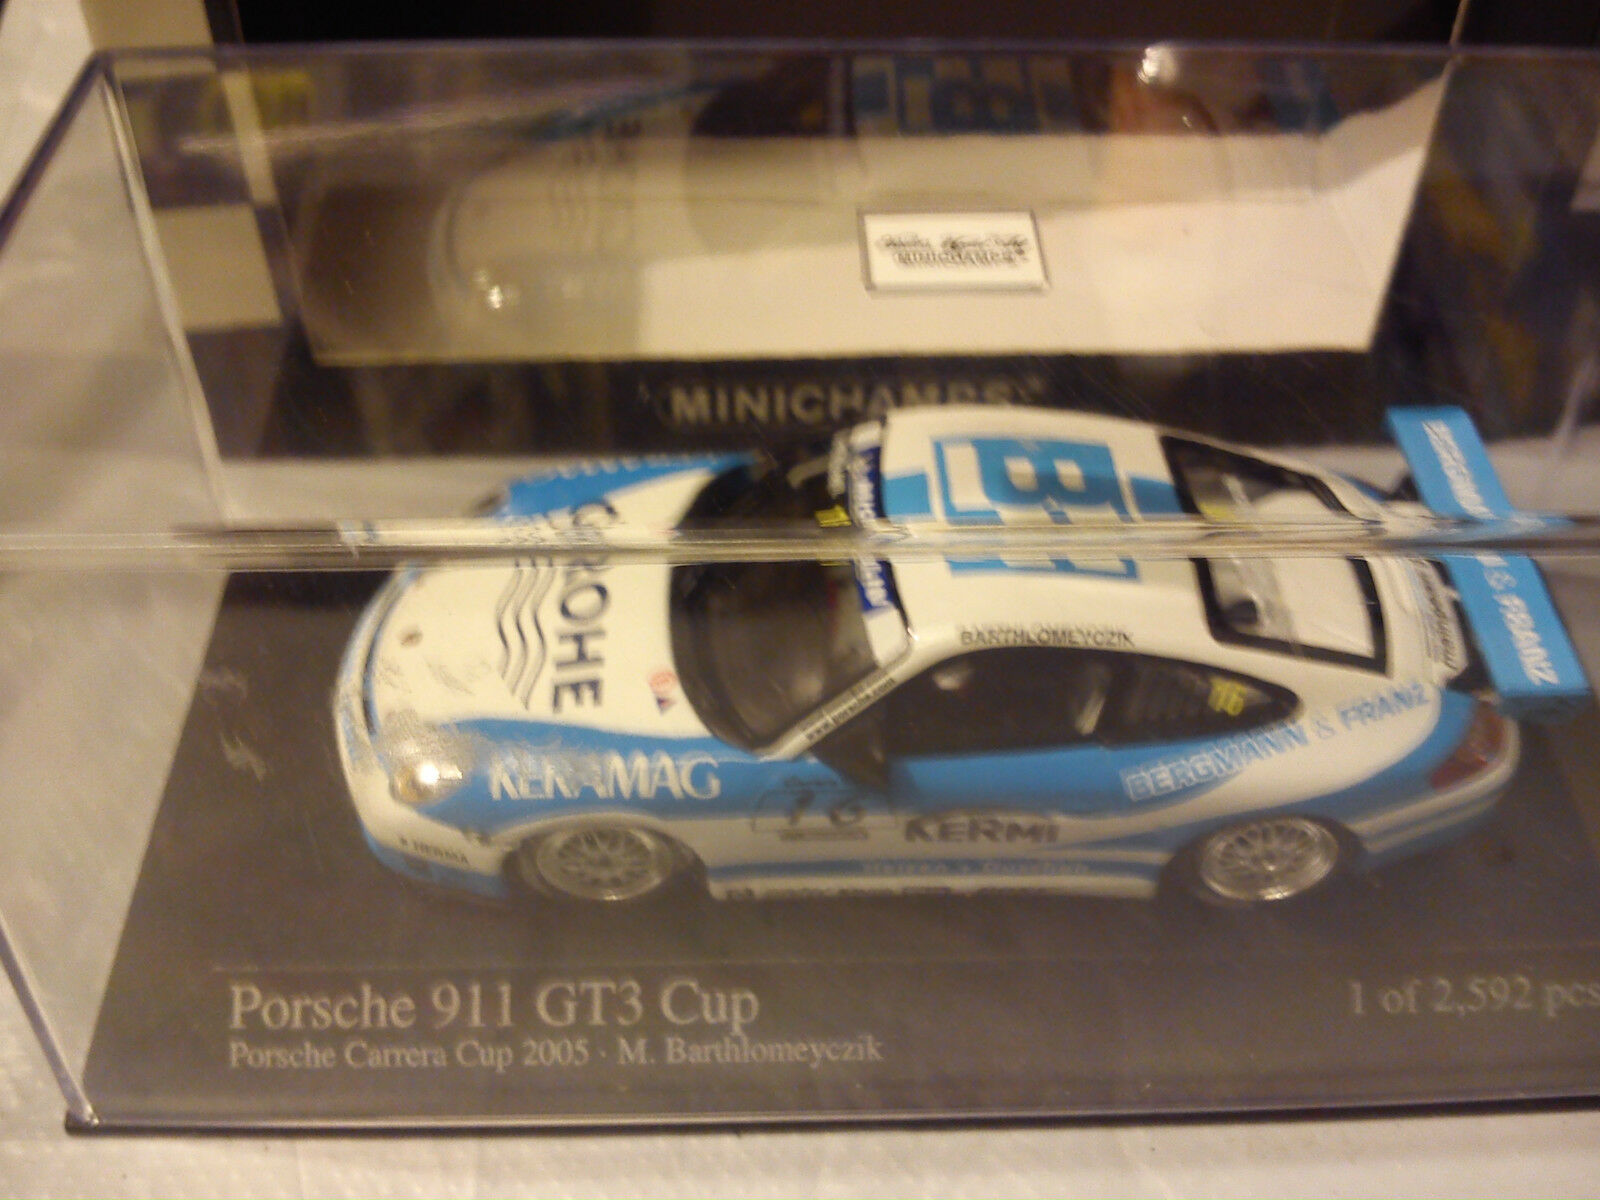 MINICHAMPS 1 43 PORSCHE 911 GT3 CUP 2005